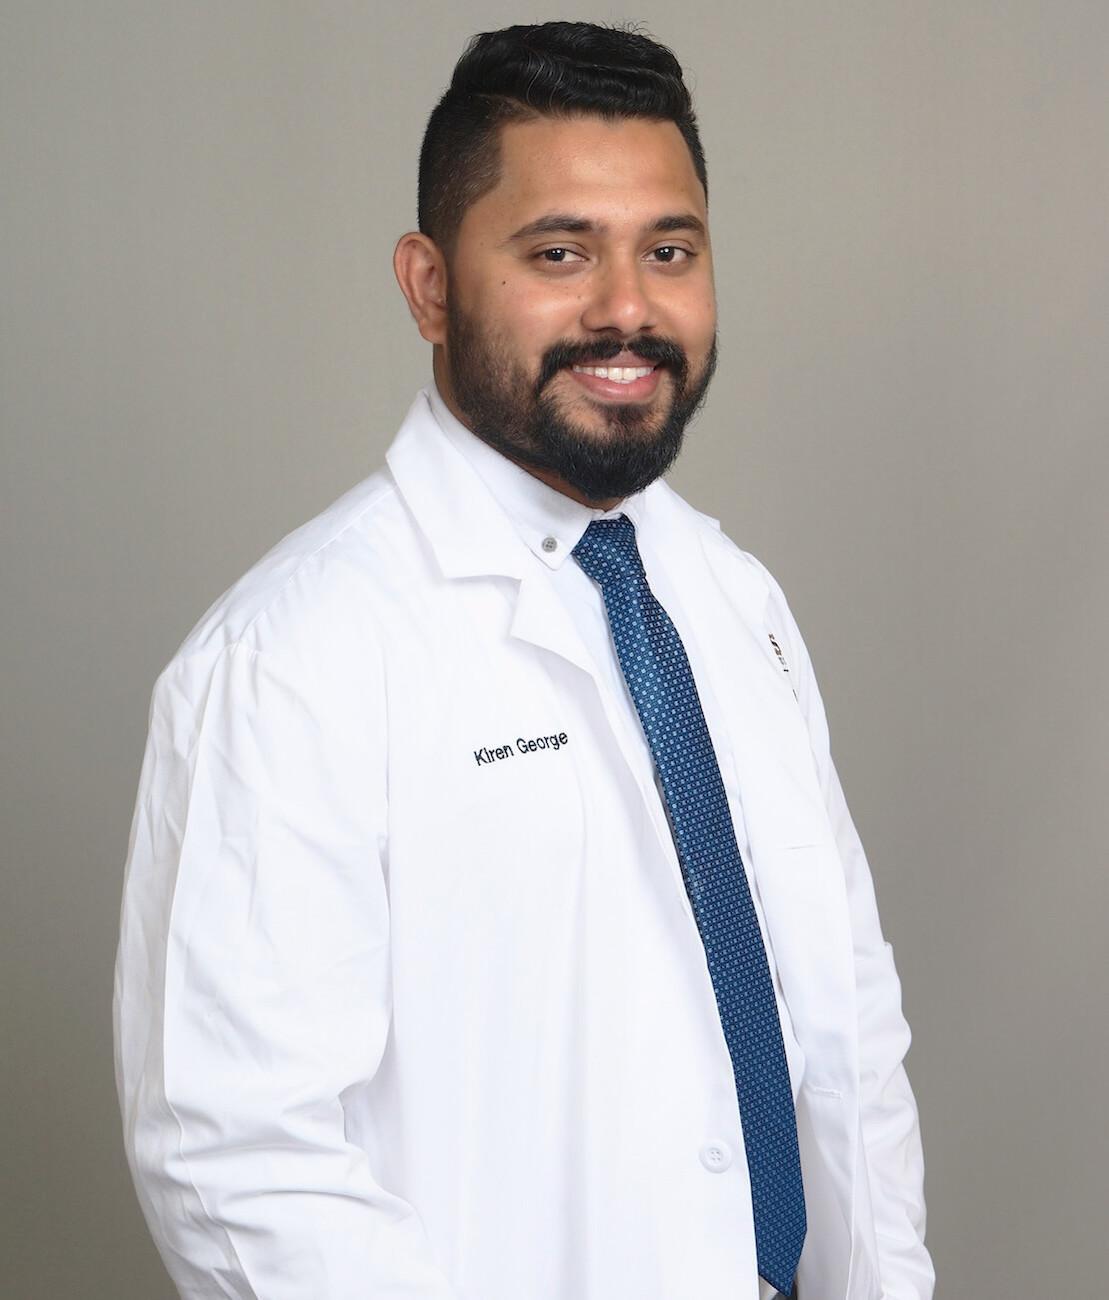 Dr. Kiren George, DMD